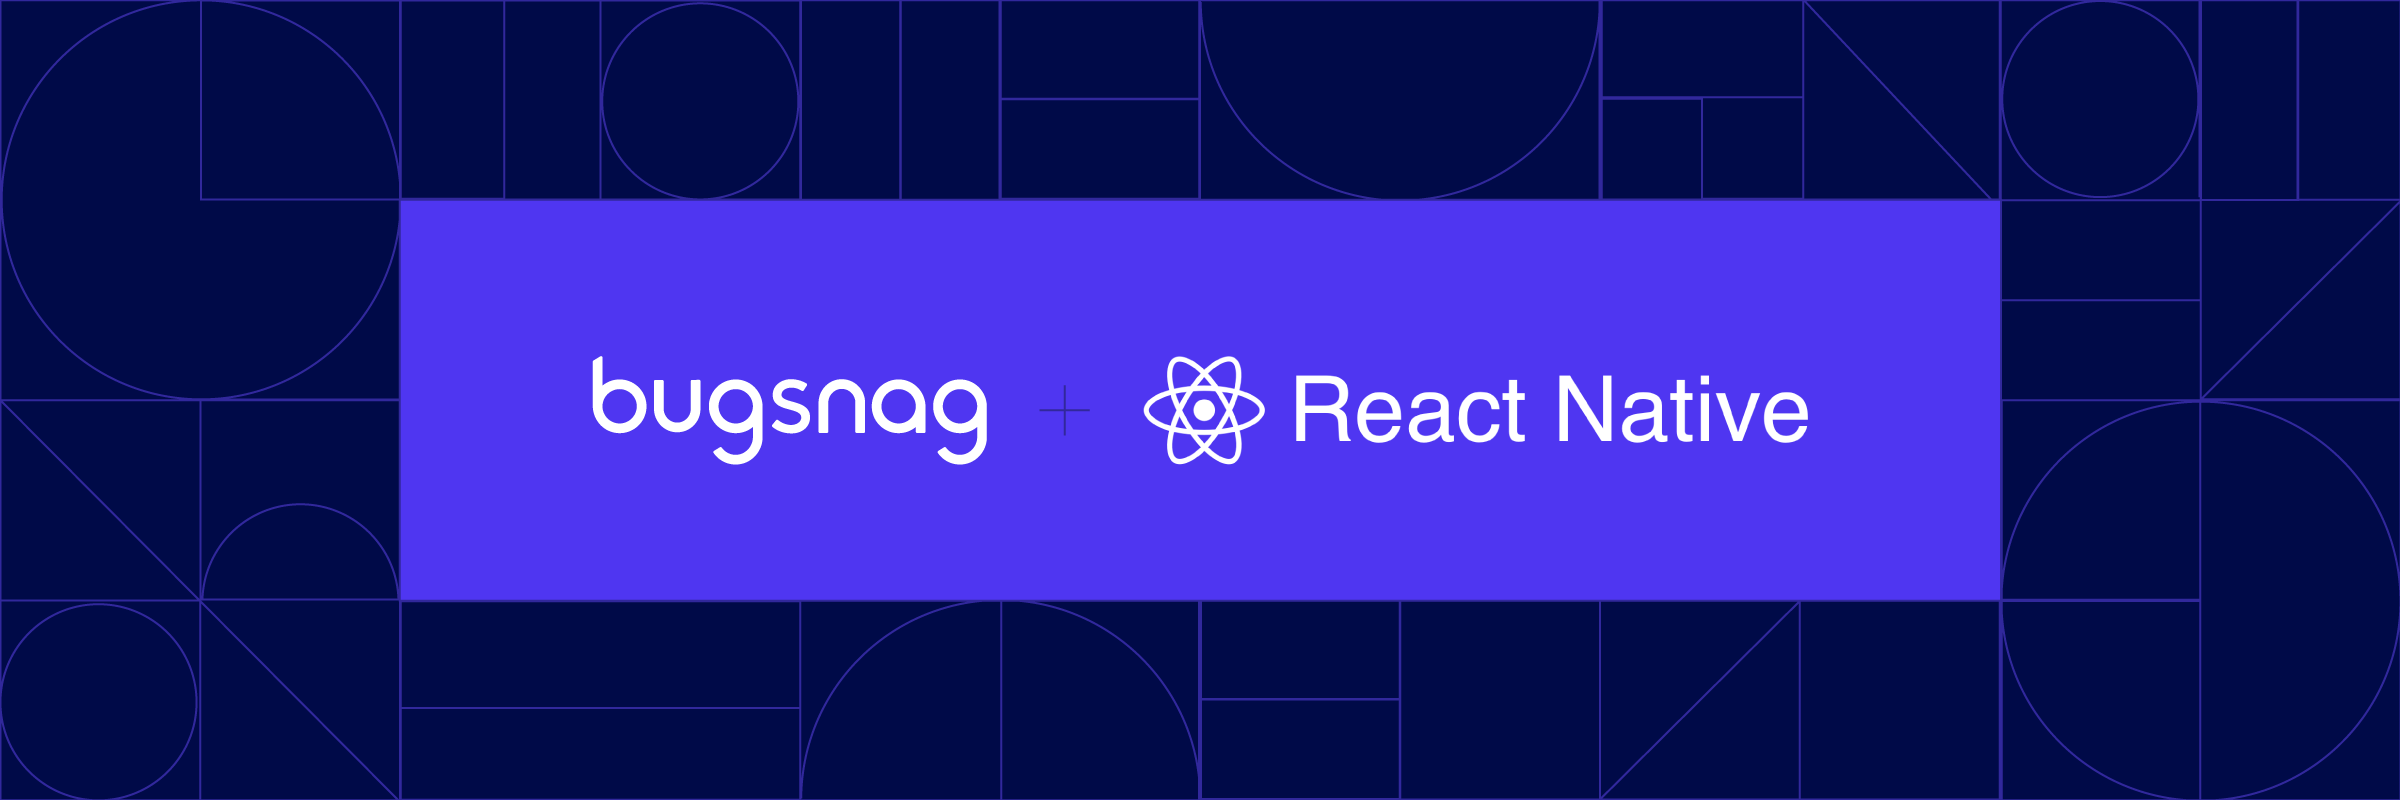 Crash reporting for React Native | Bugsnag Blog